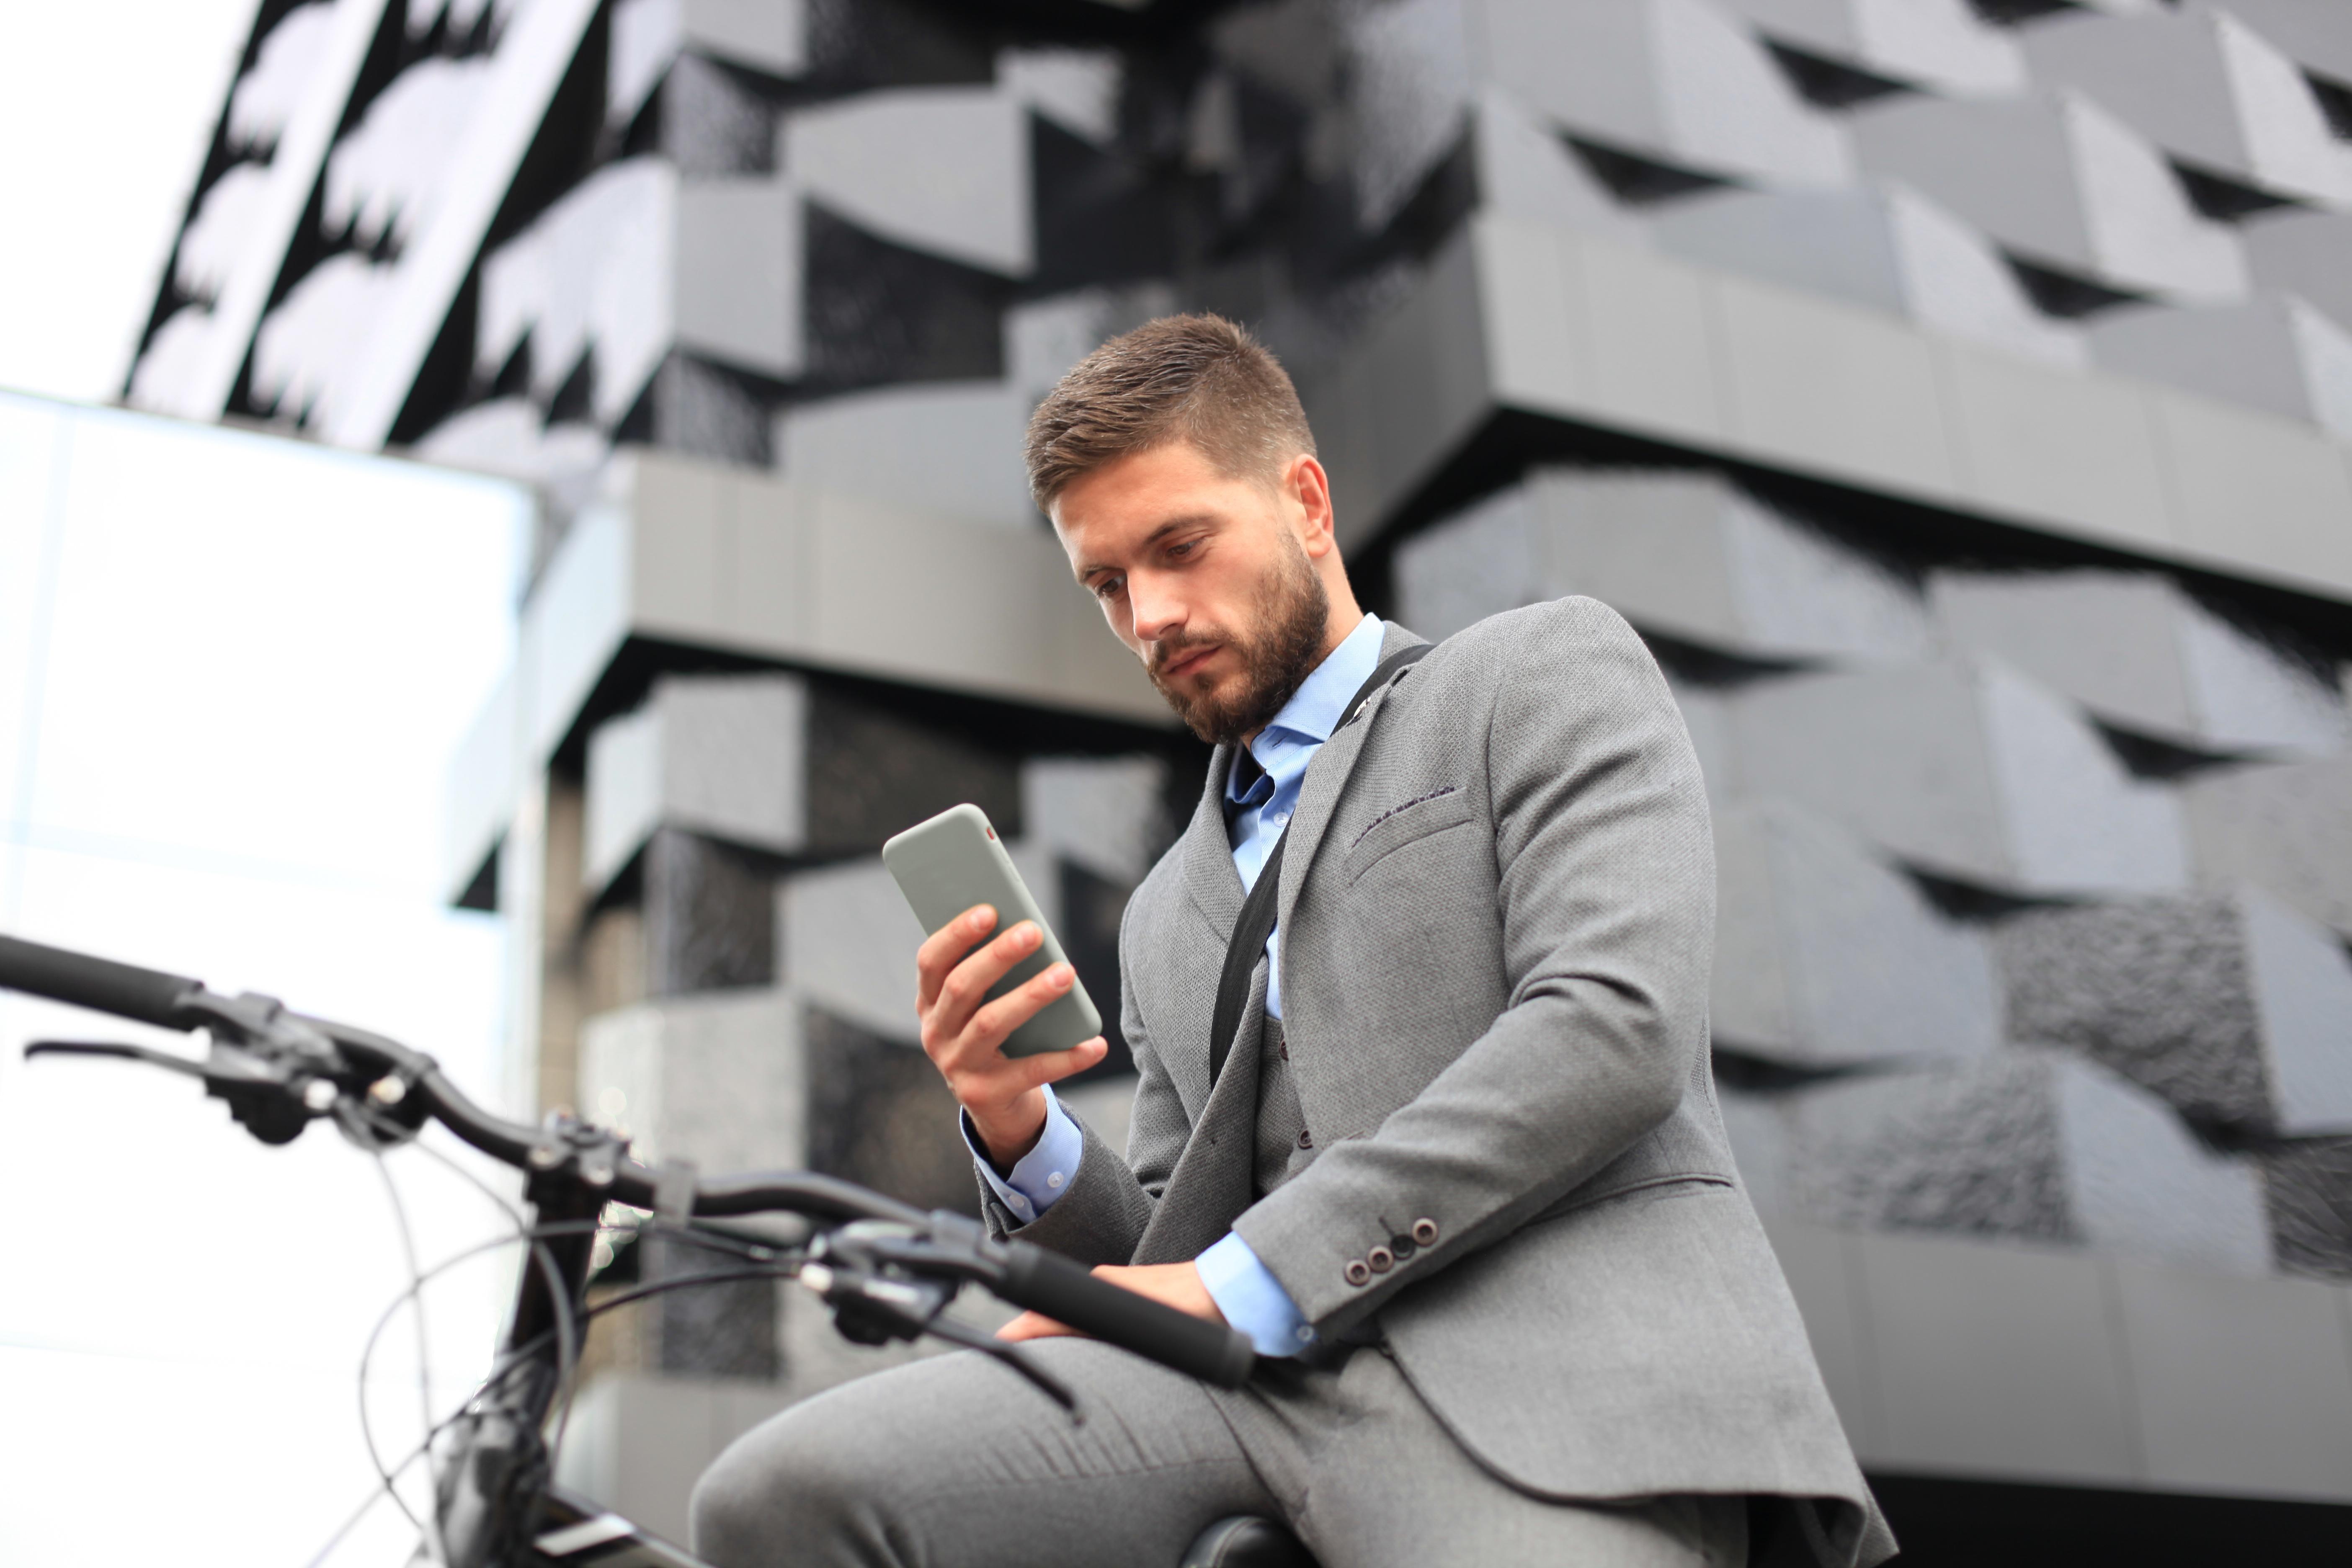 MobileAppOnBike